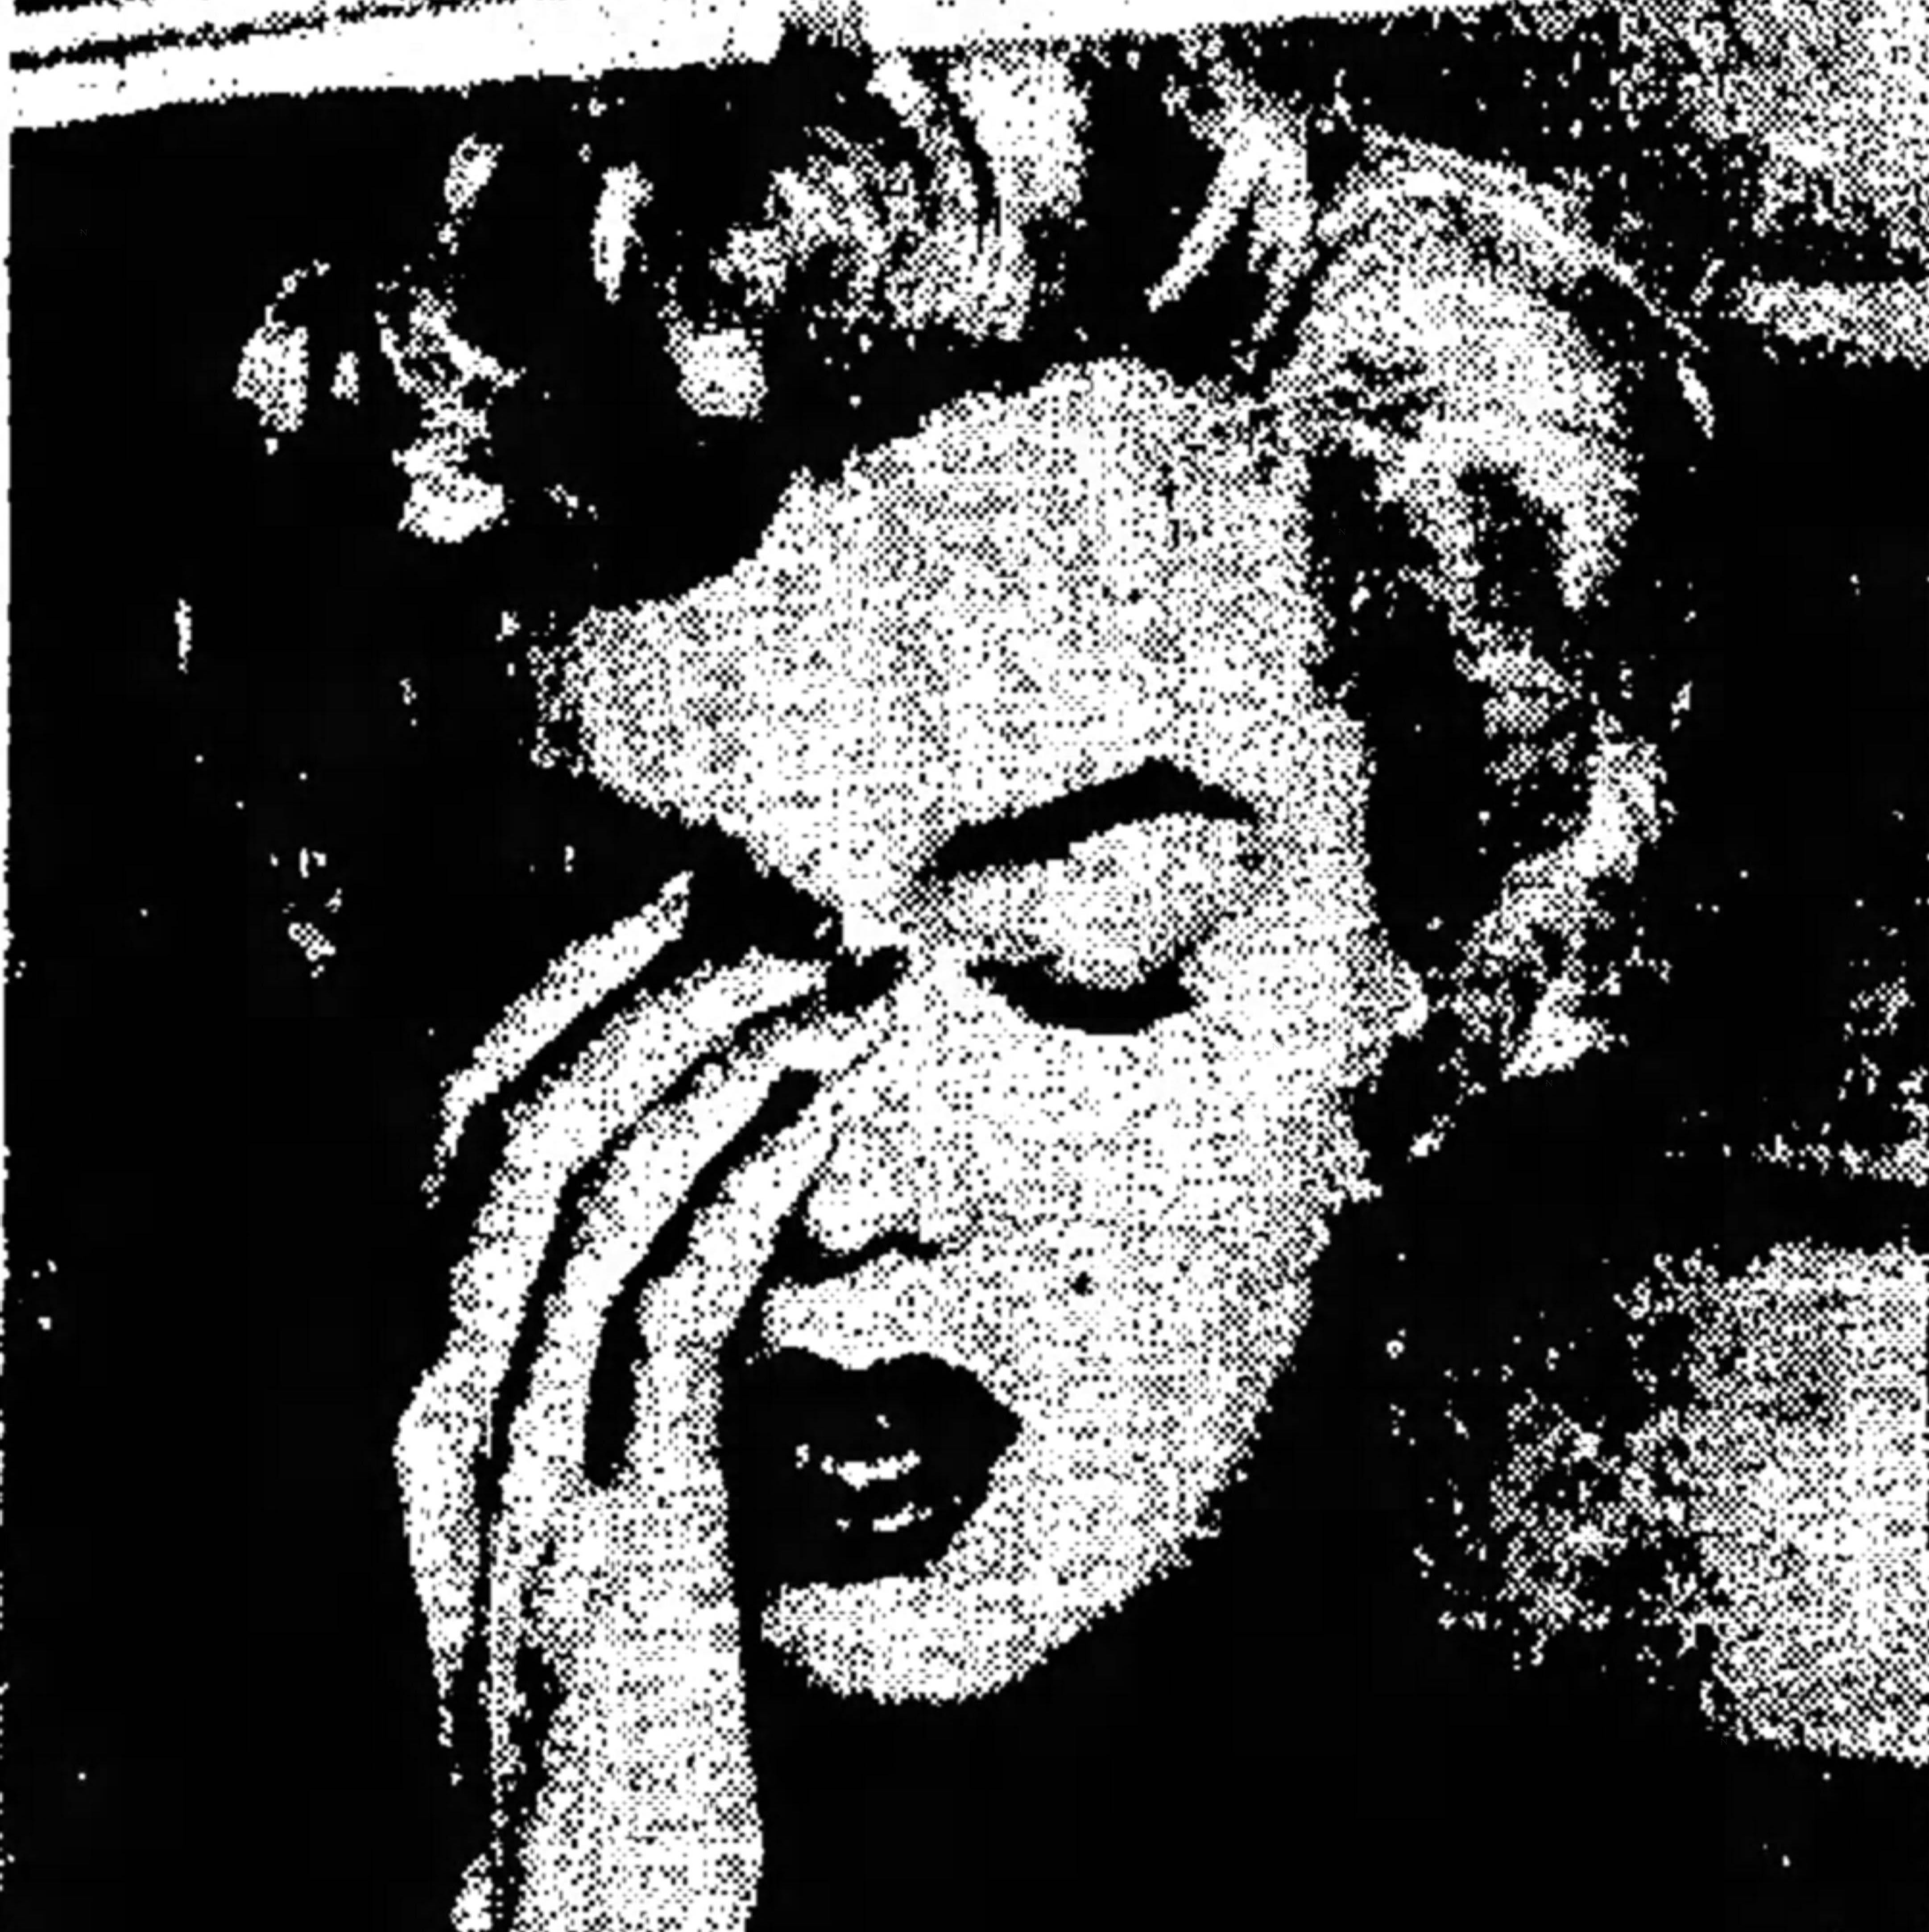 Marilyn Monroe asks for tacos, enchiladas before Juarez divorce